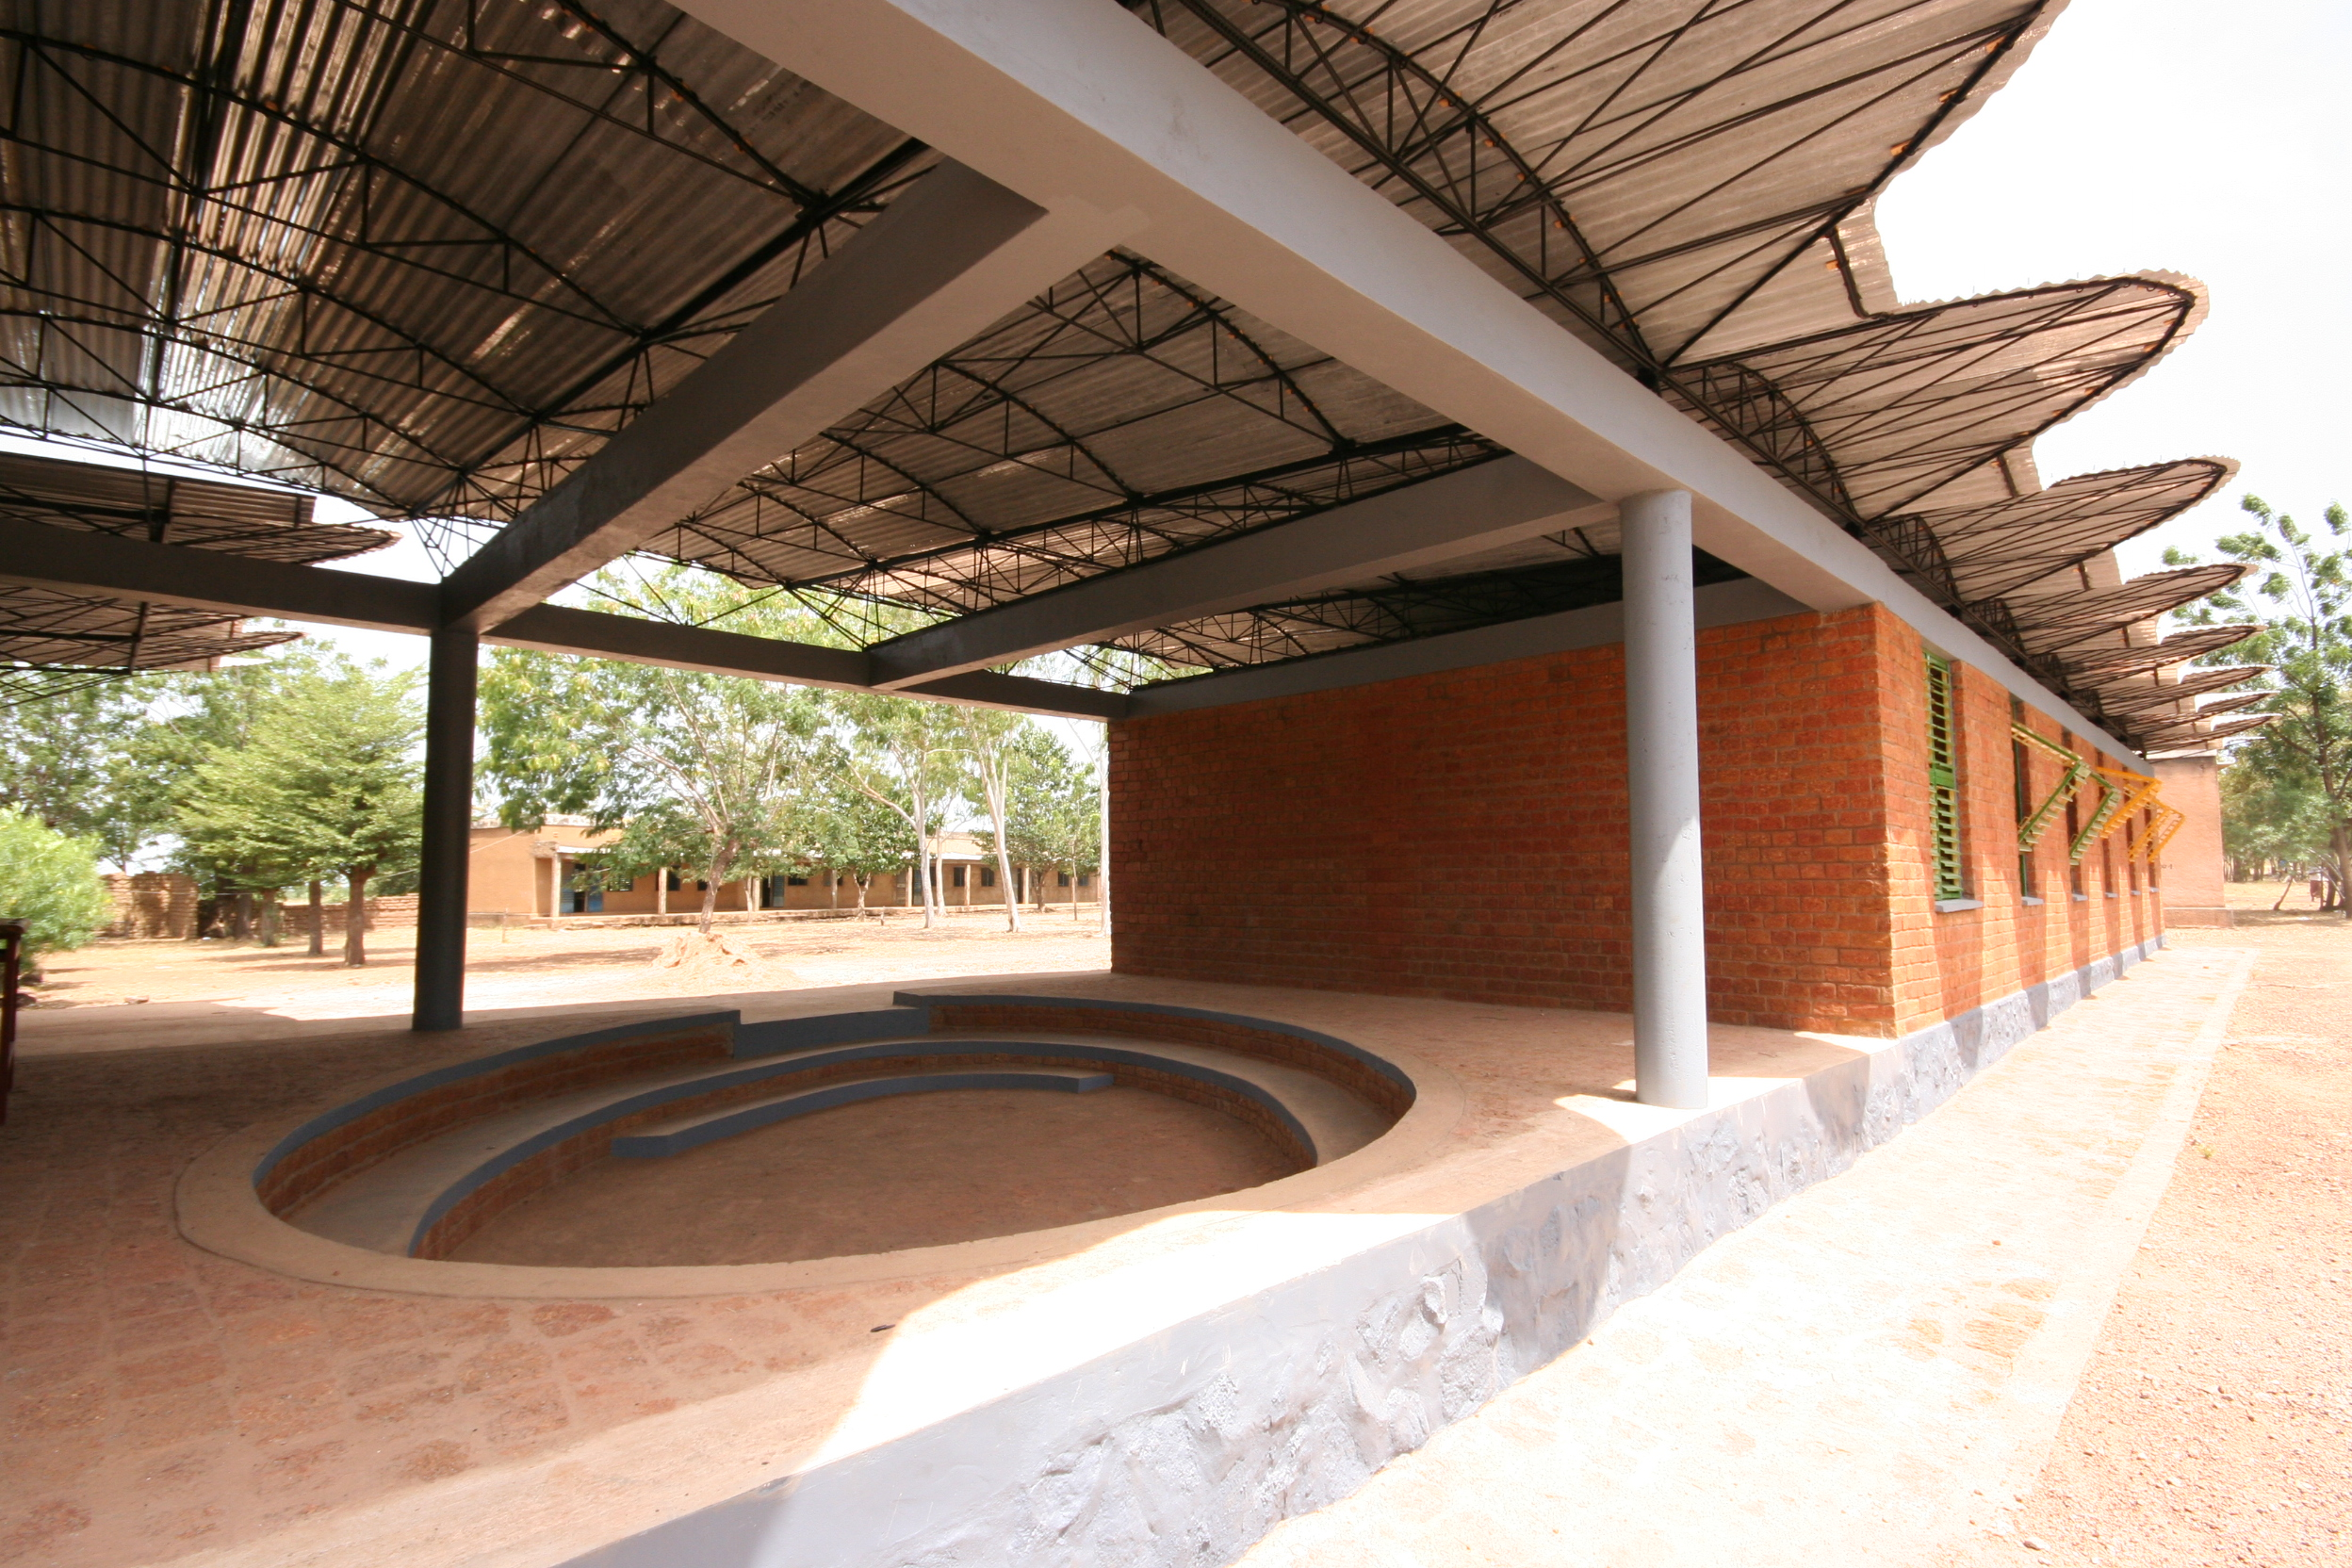 Secondary School in Dano, Burkina Faso by Francis Kéré - Image courtesy of Kéré Architecture